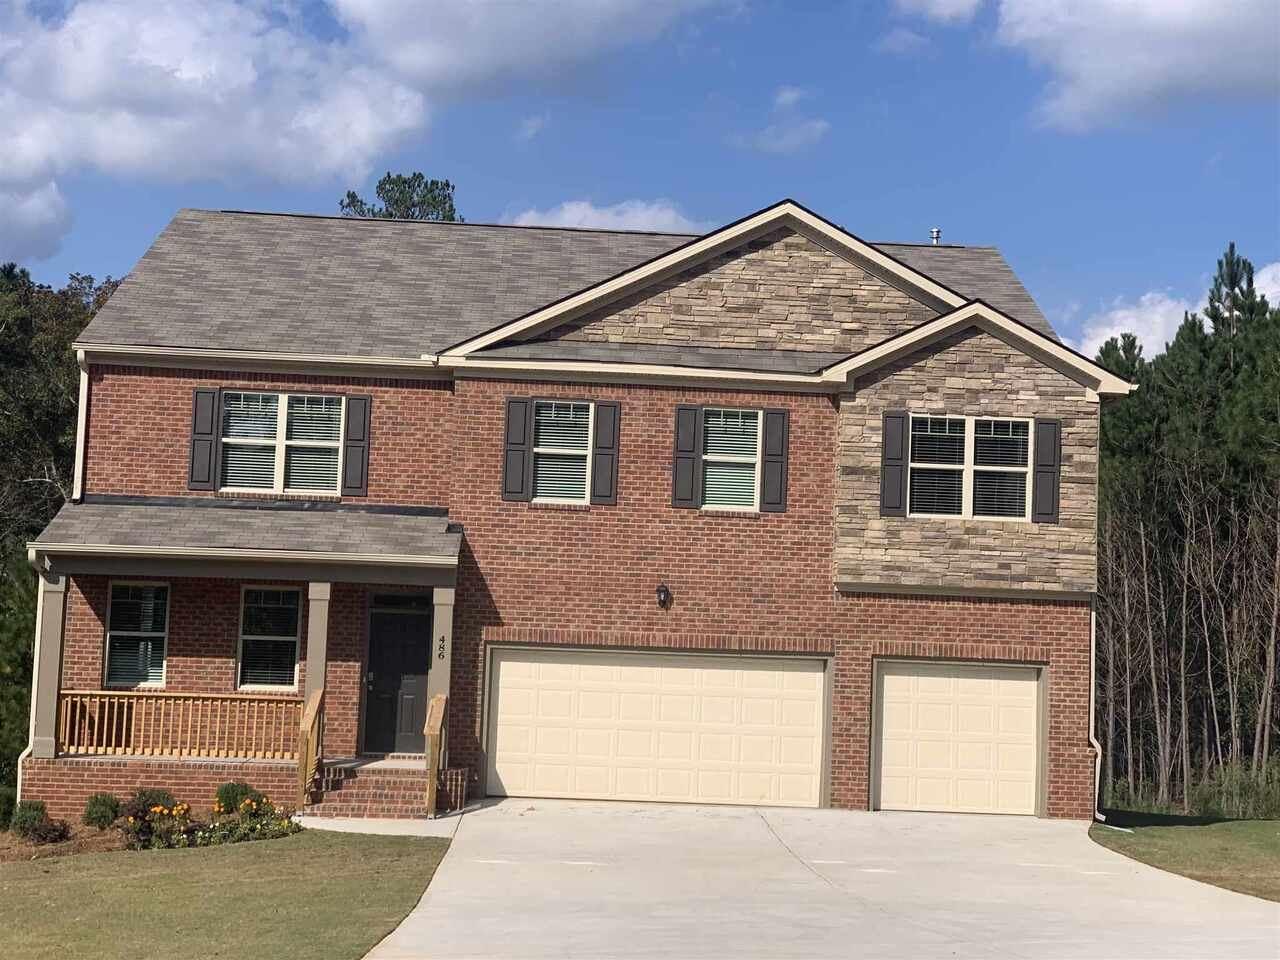 821 Tallowtree Ln, McDonough, GA 30252 - MLS#: 8911435